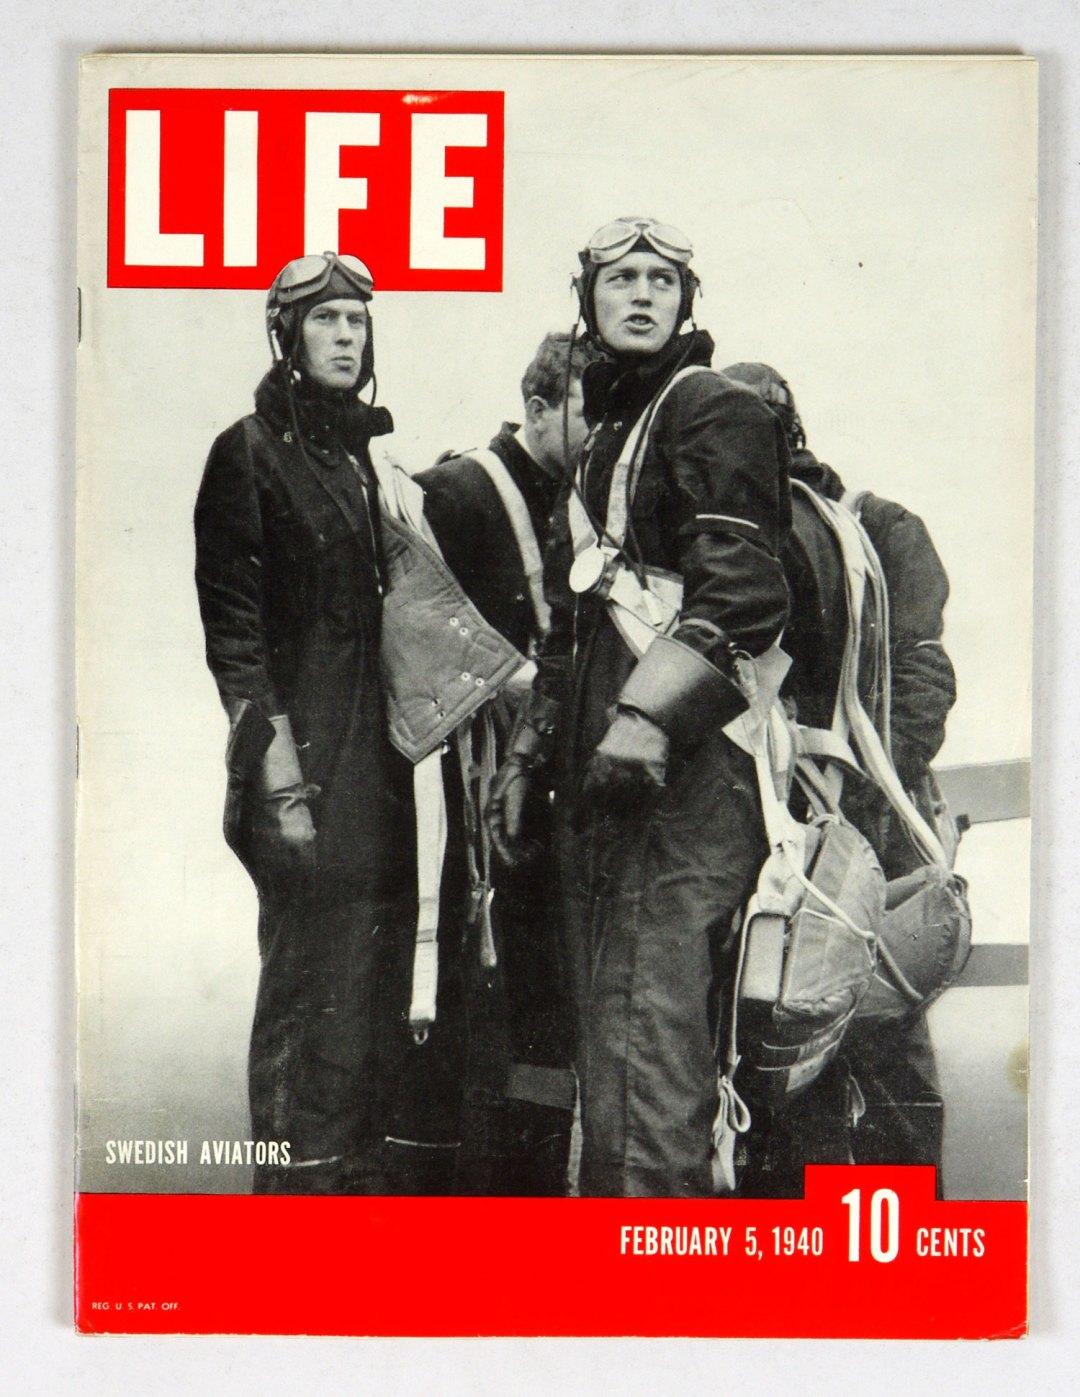 LIFE Magazine 1940 February 5 Swedish Aviators